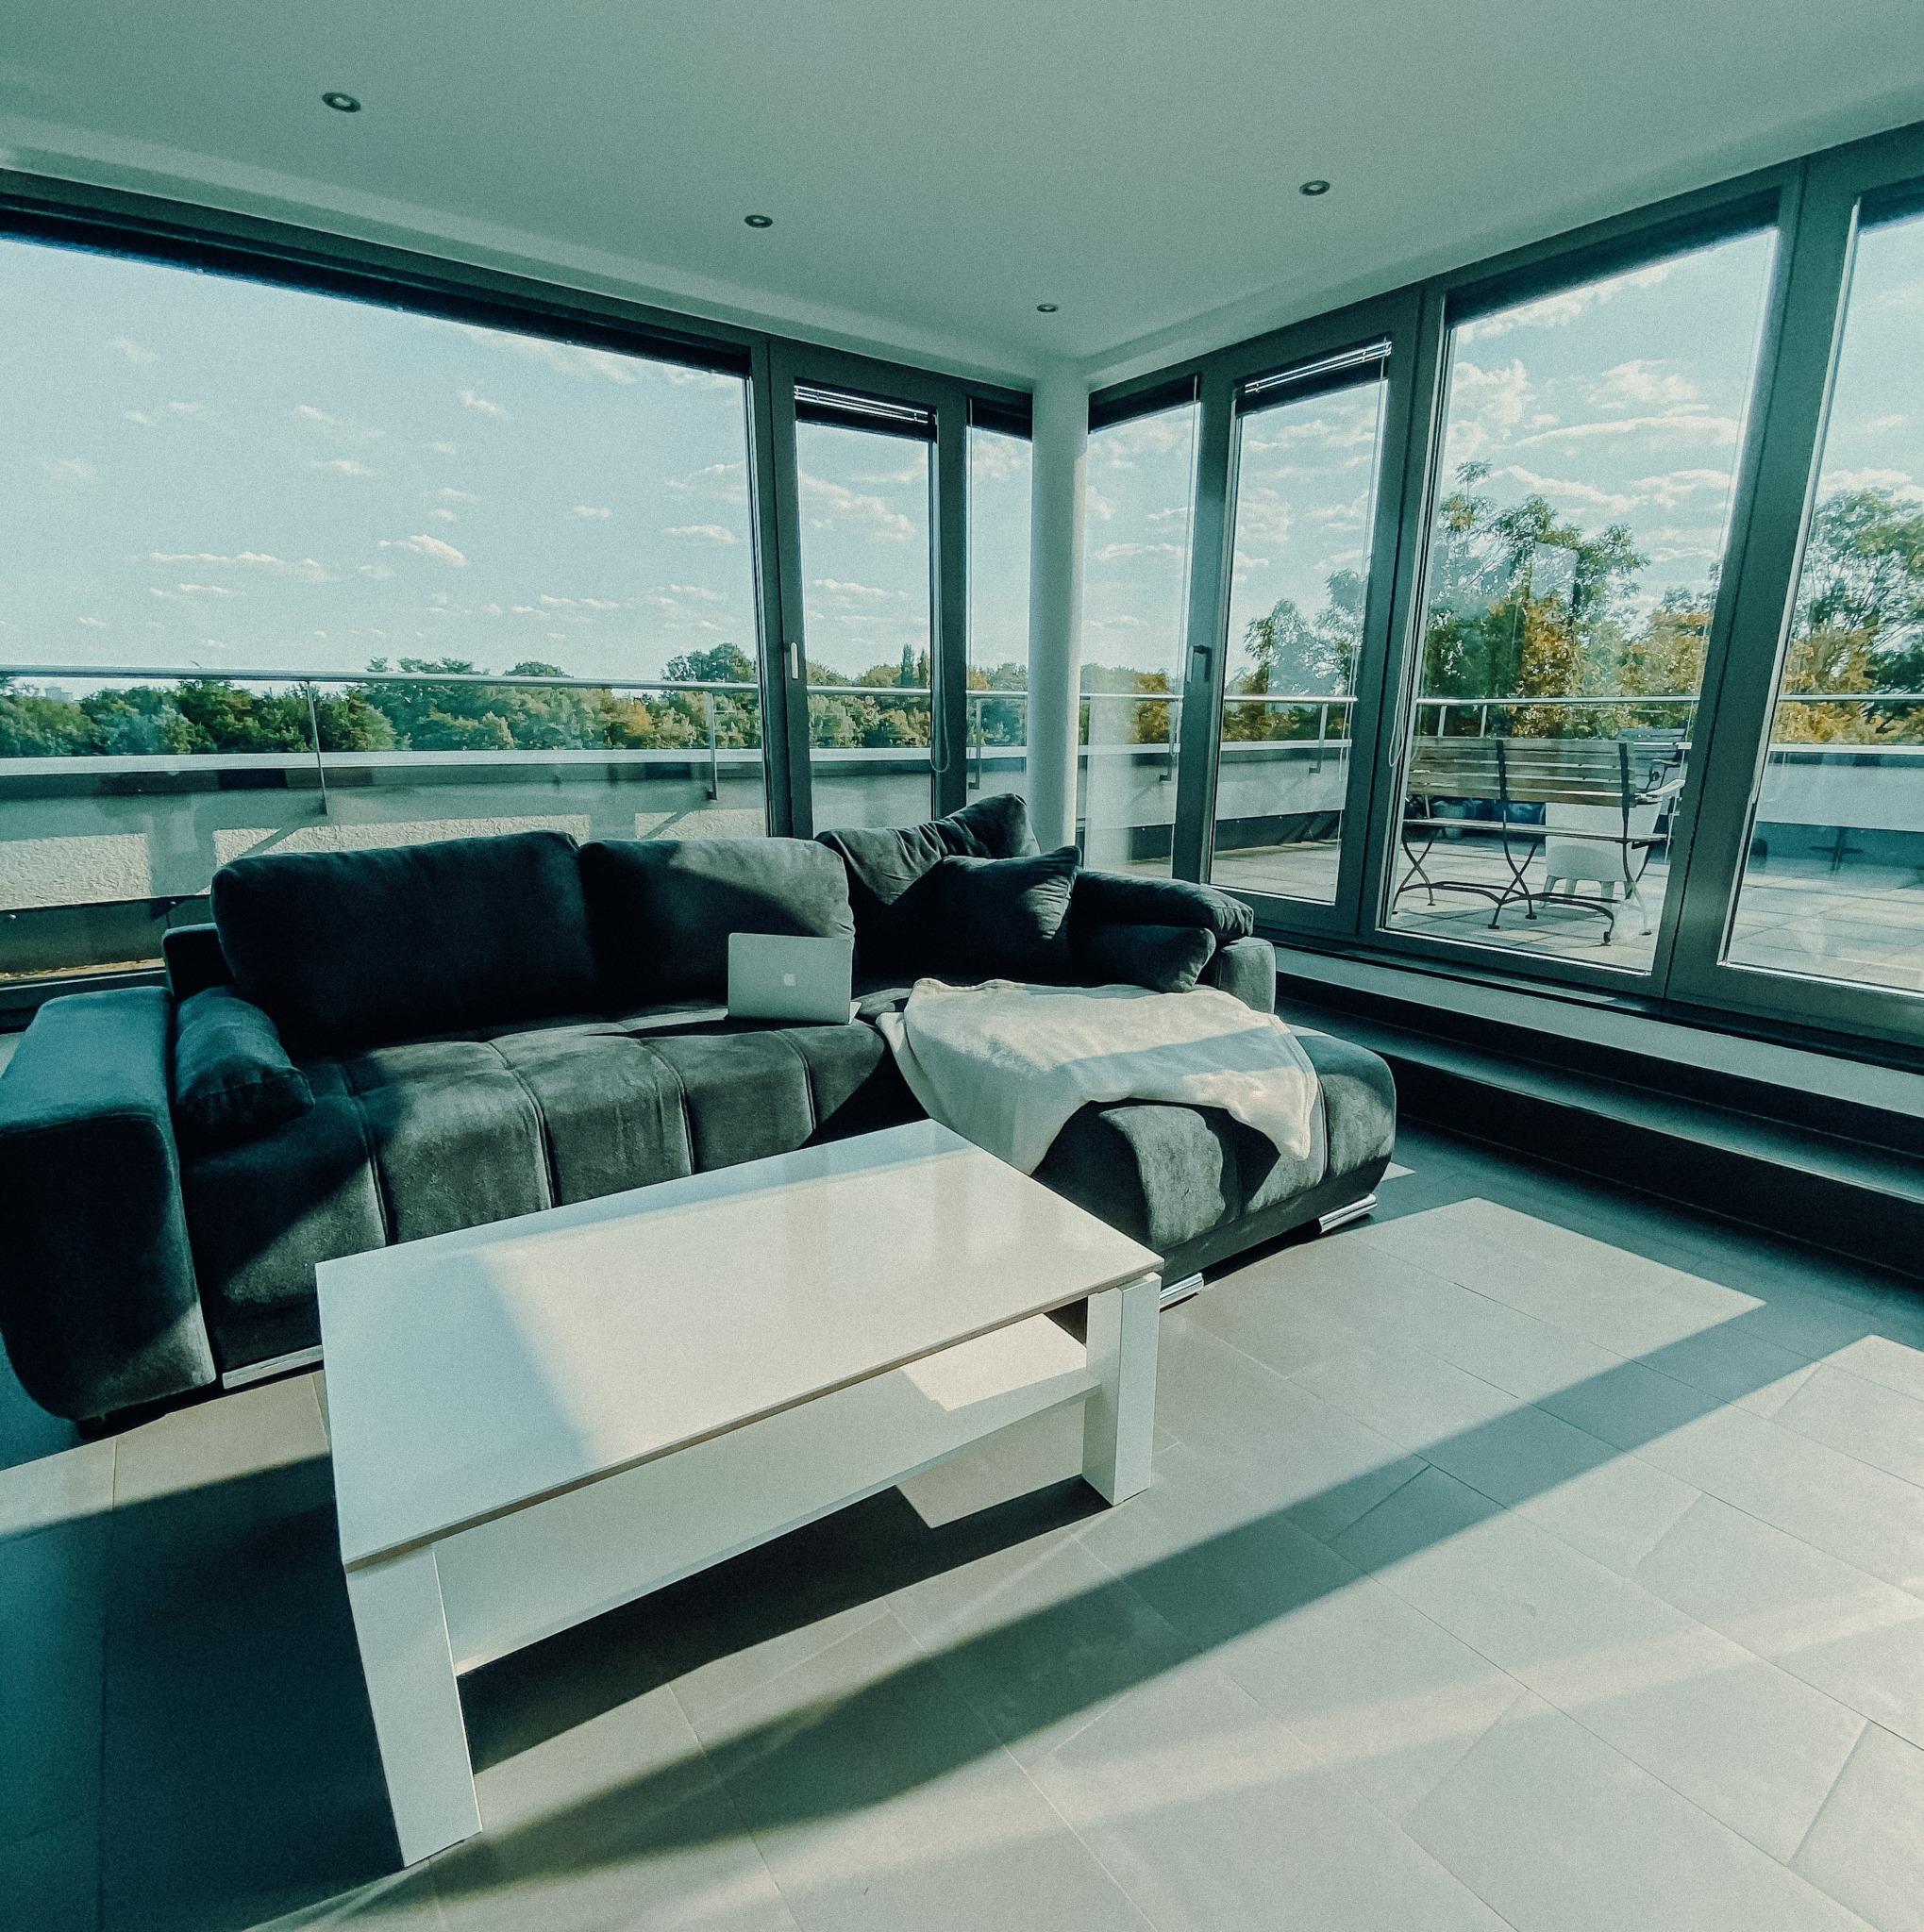 A white and black sofa near a glass window.